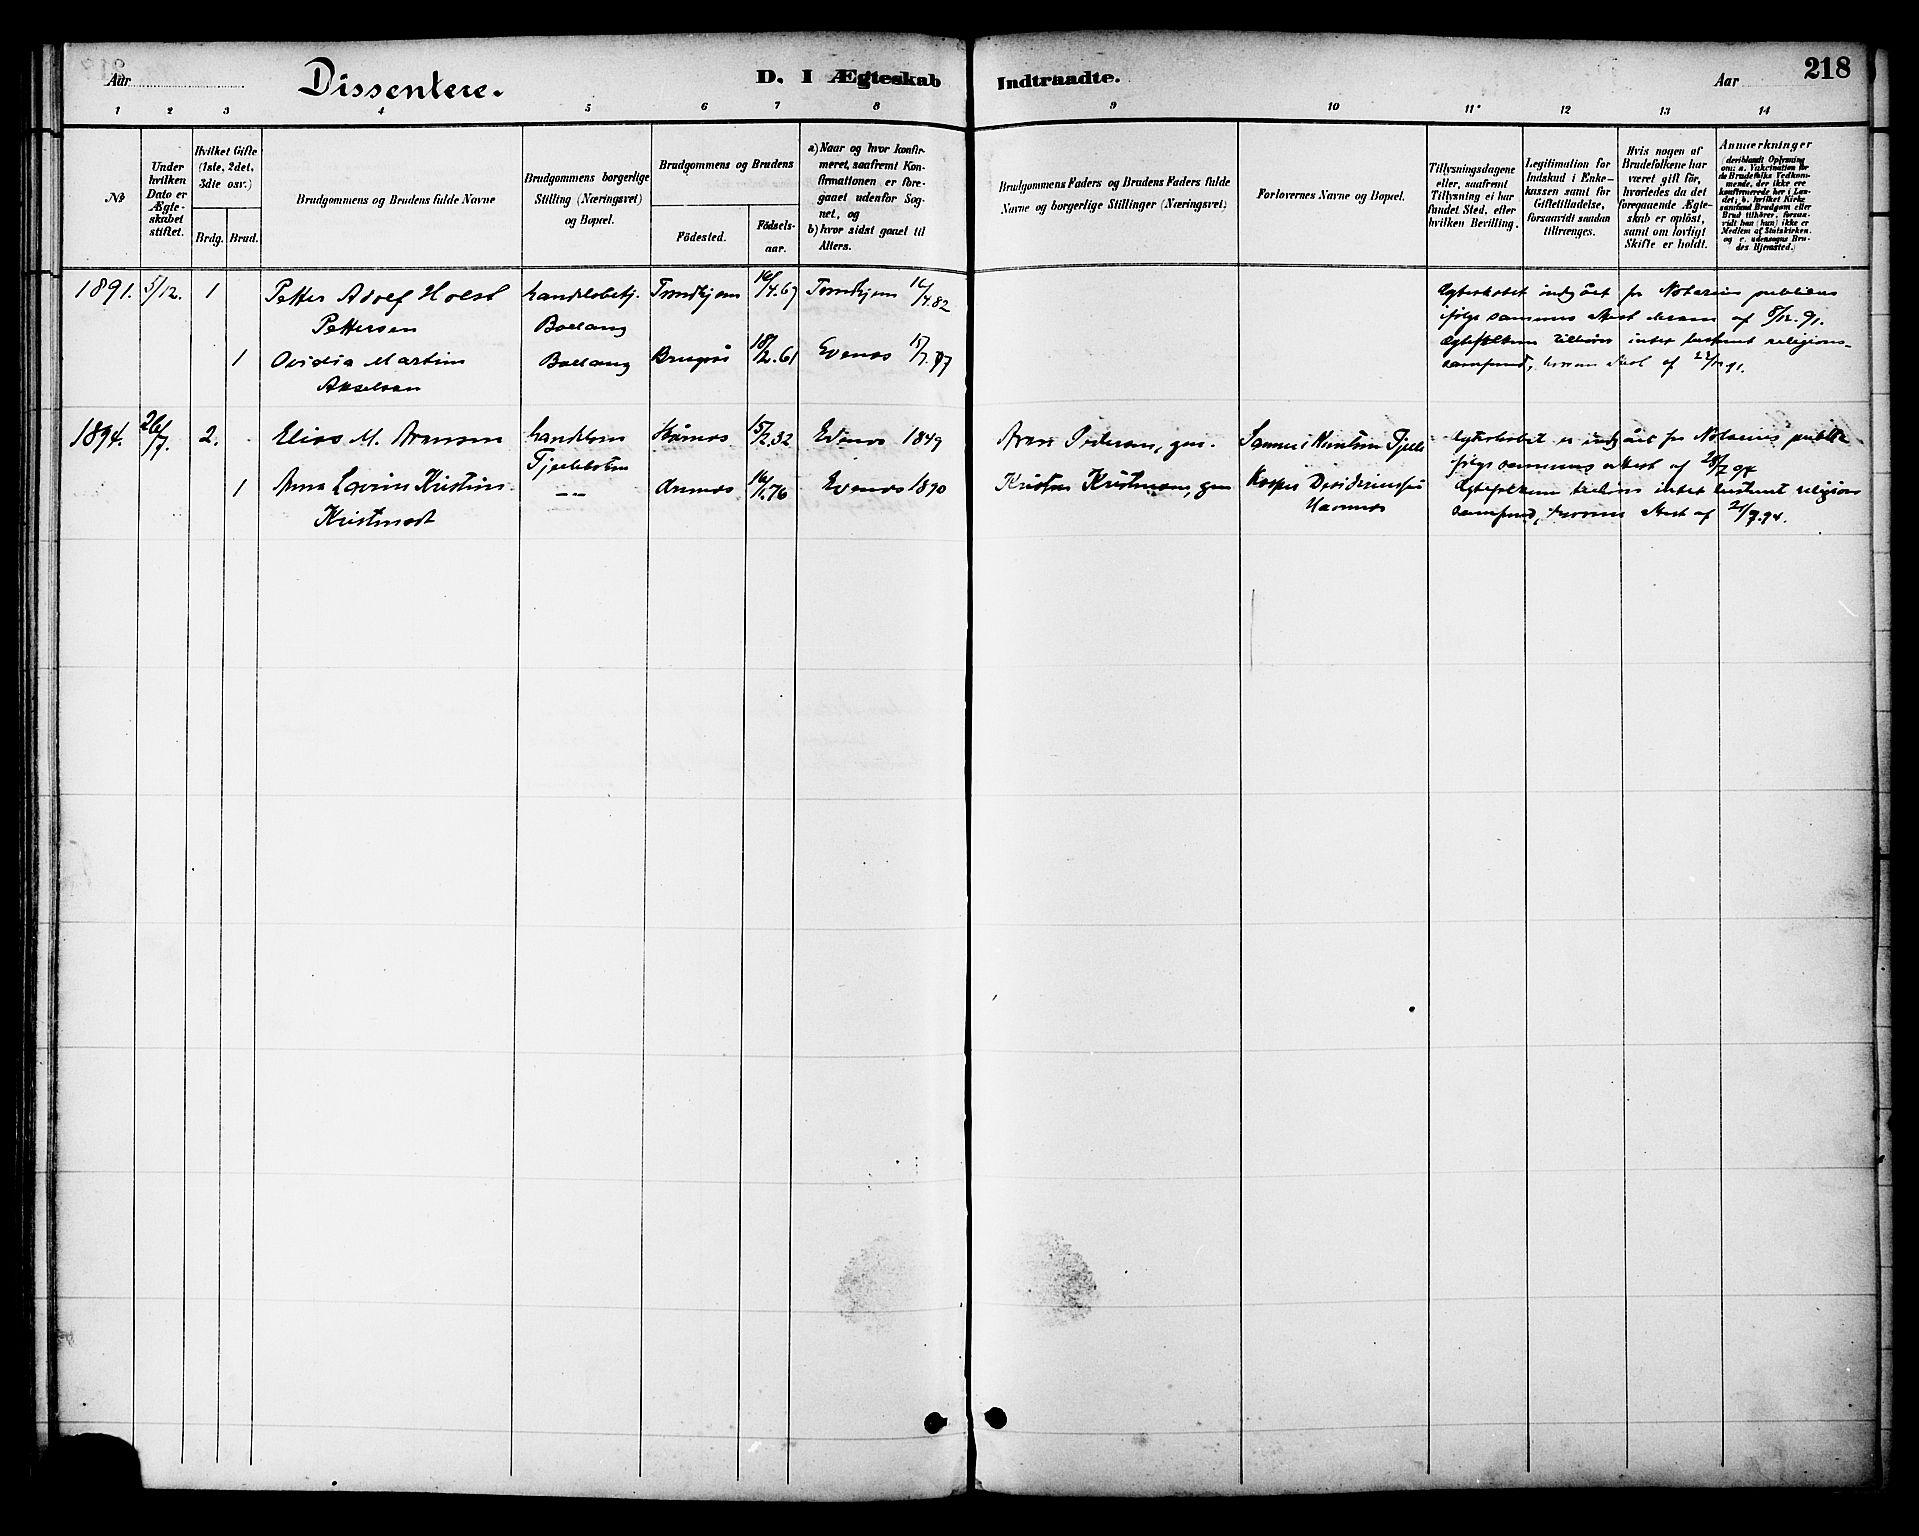 SAT, Ministerialprotokoller, klokkerbøker og fødselsregistre - Nordland, 863/L0898: Ministerialbok nr. 863A10, 1886-1897, s. 218